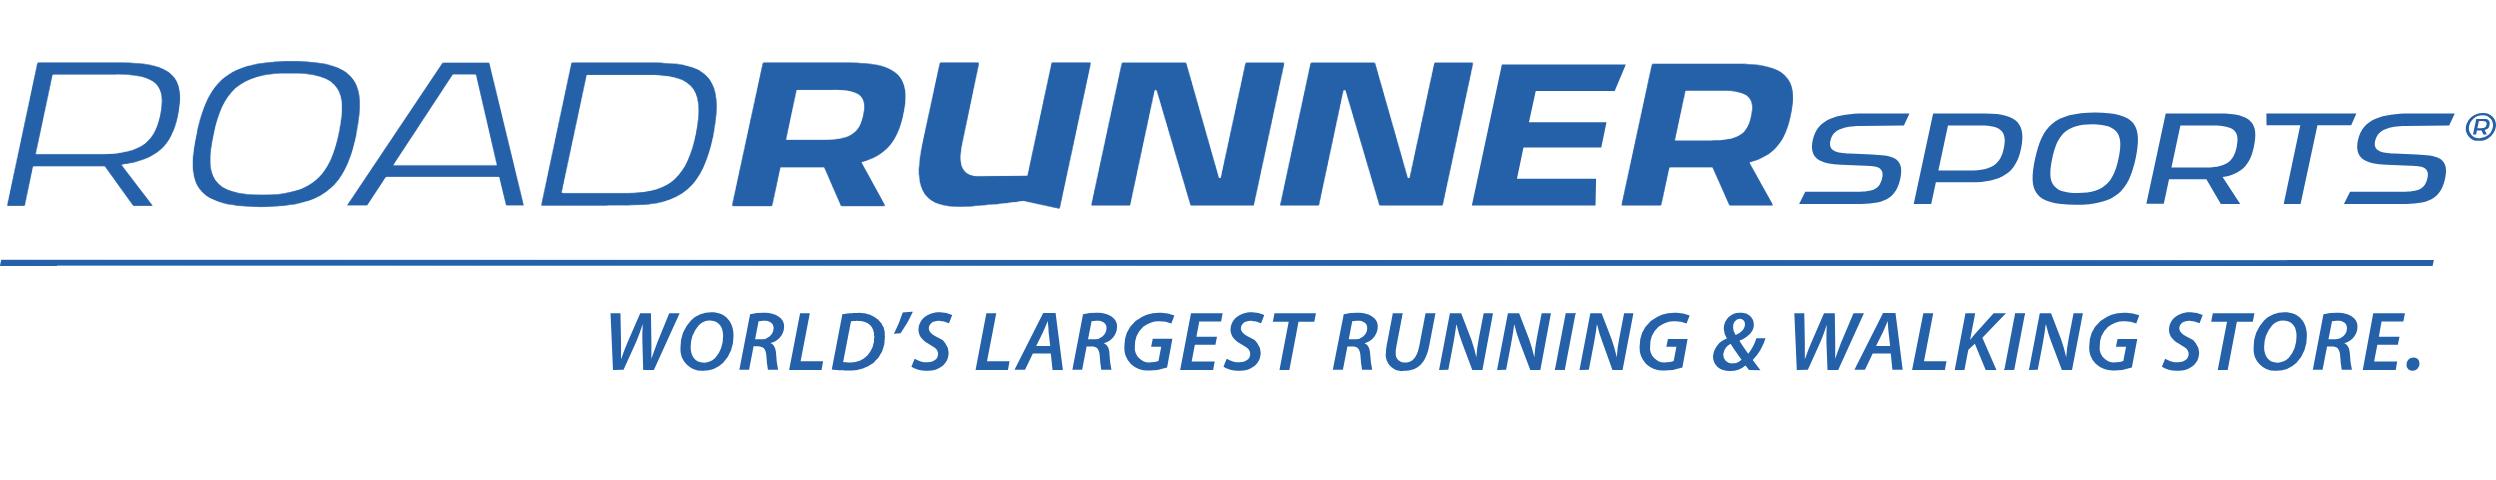 road-runner-sports-logo